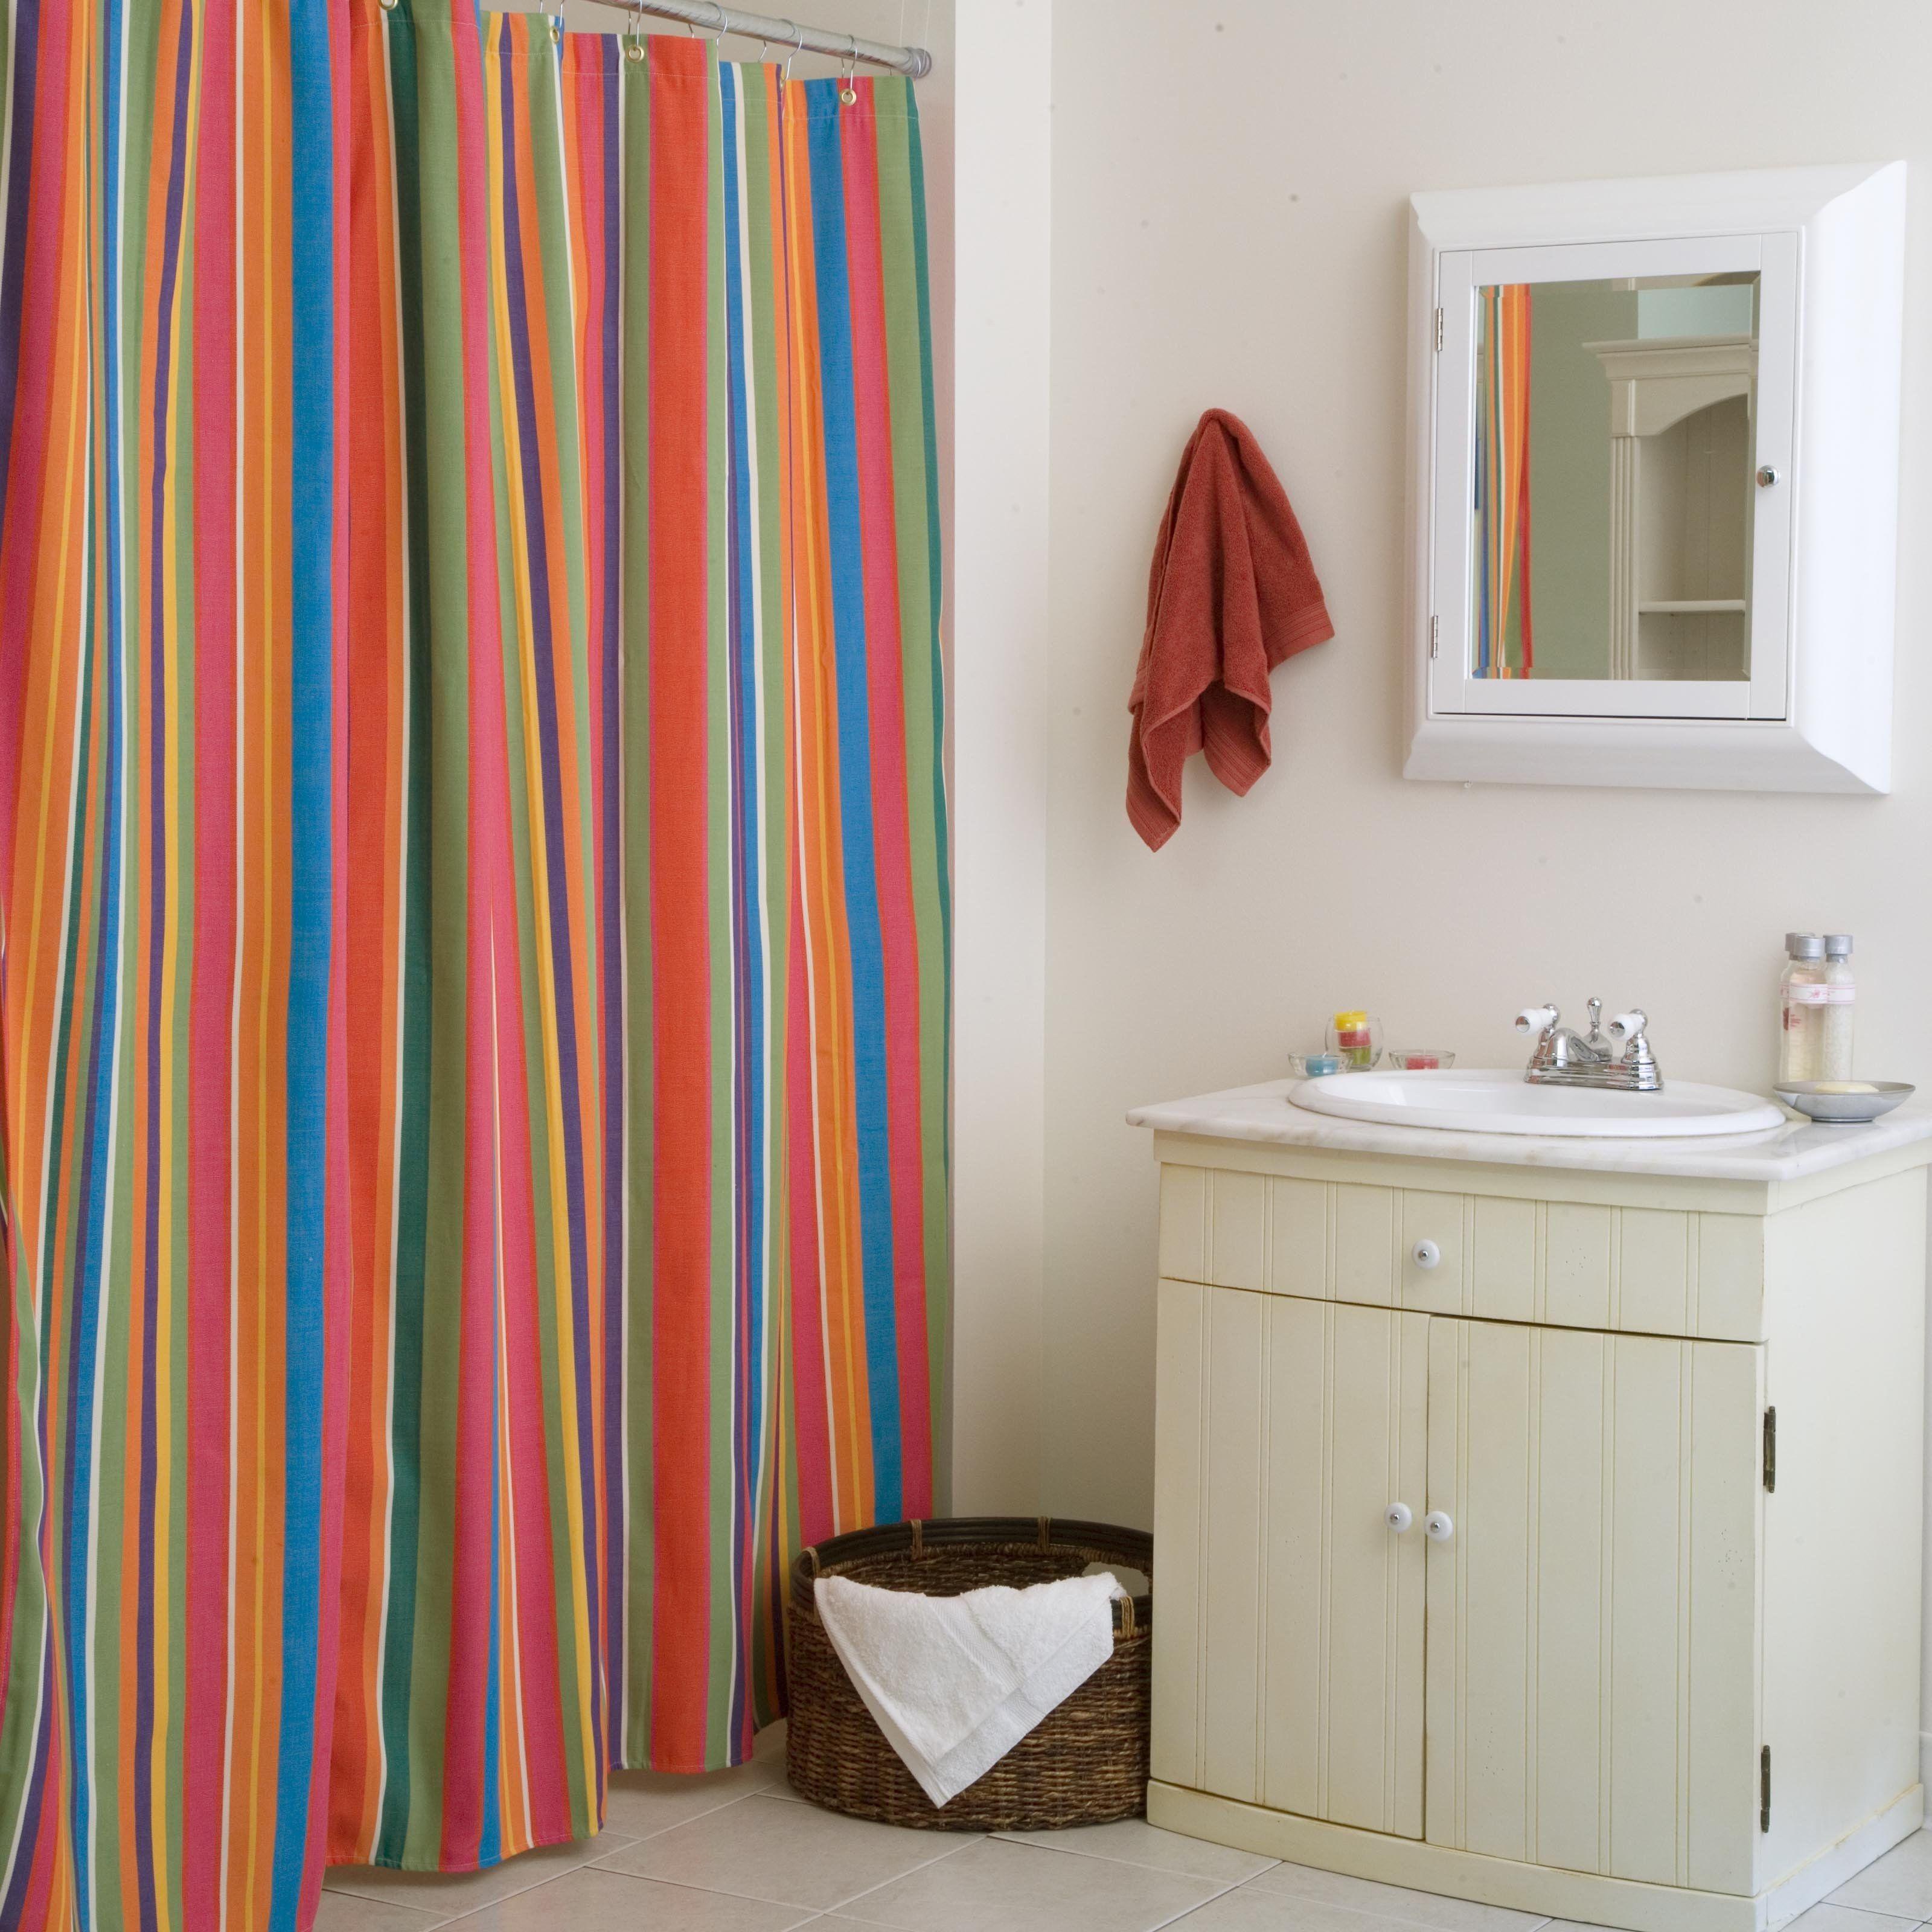 Red Chevron Stripe Shower Curtain | http://legalize-crew.com ...